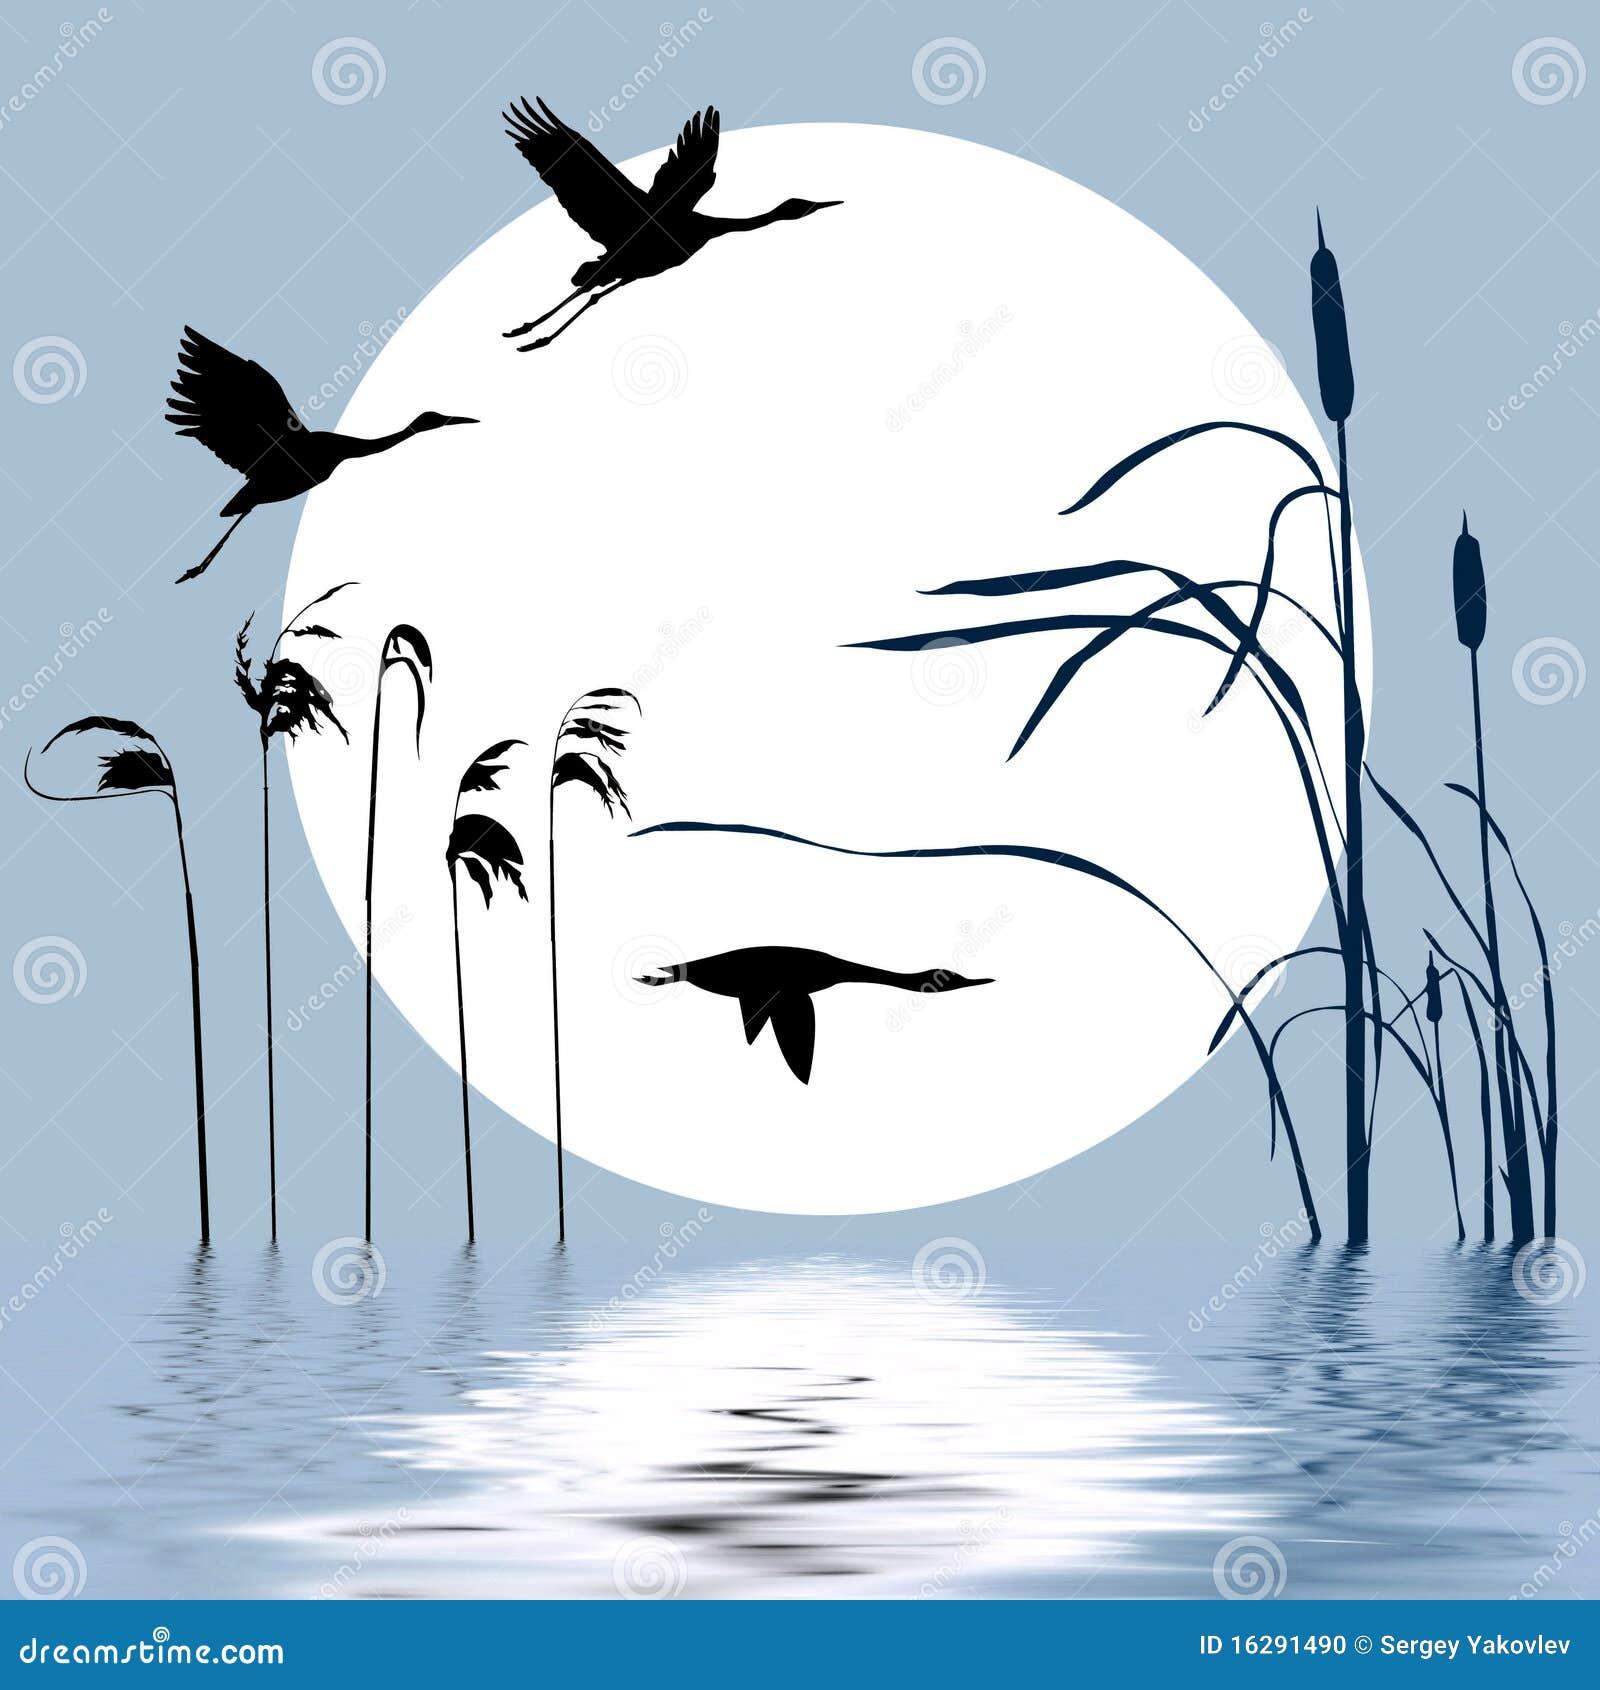 Drawing Flying Birds Stock Photo Image 16291490